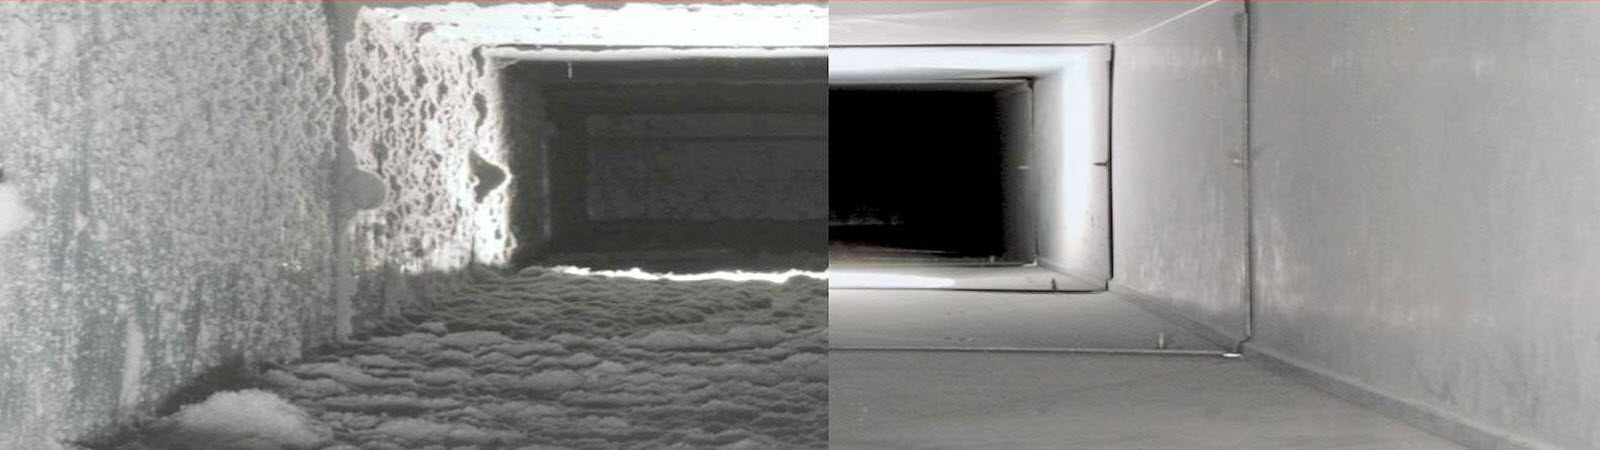 Hvac Effectiveness Amp Other Benefits Of Uv Light